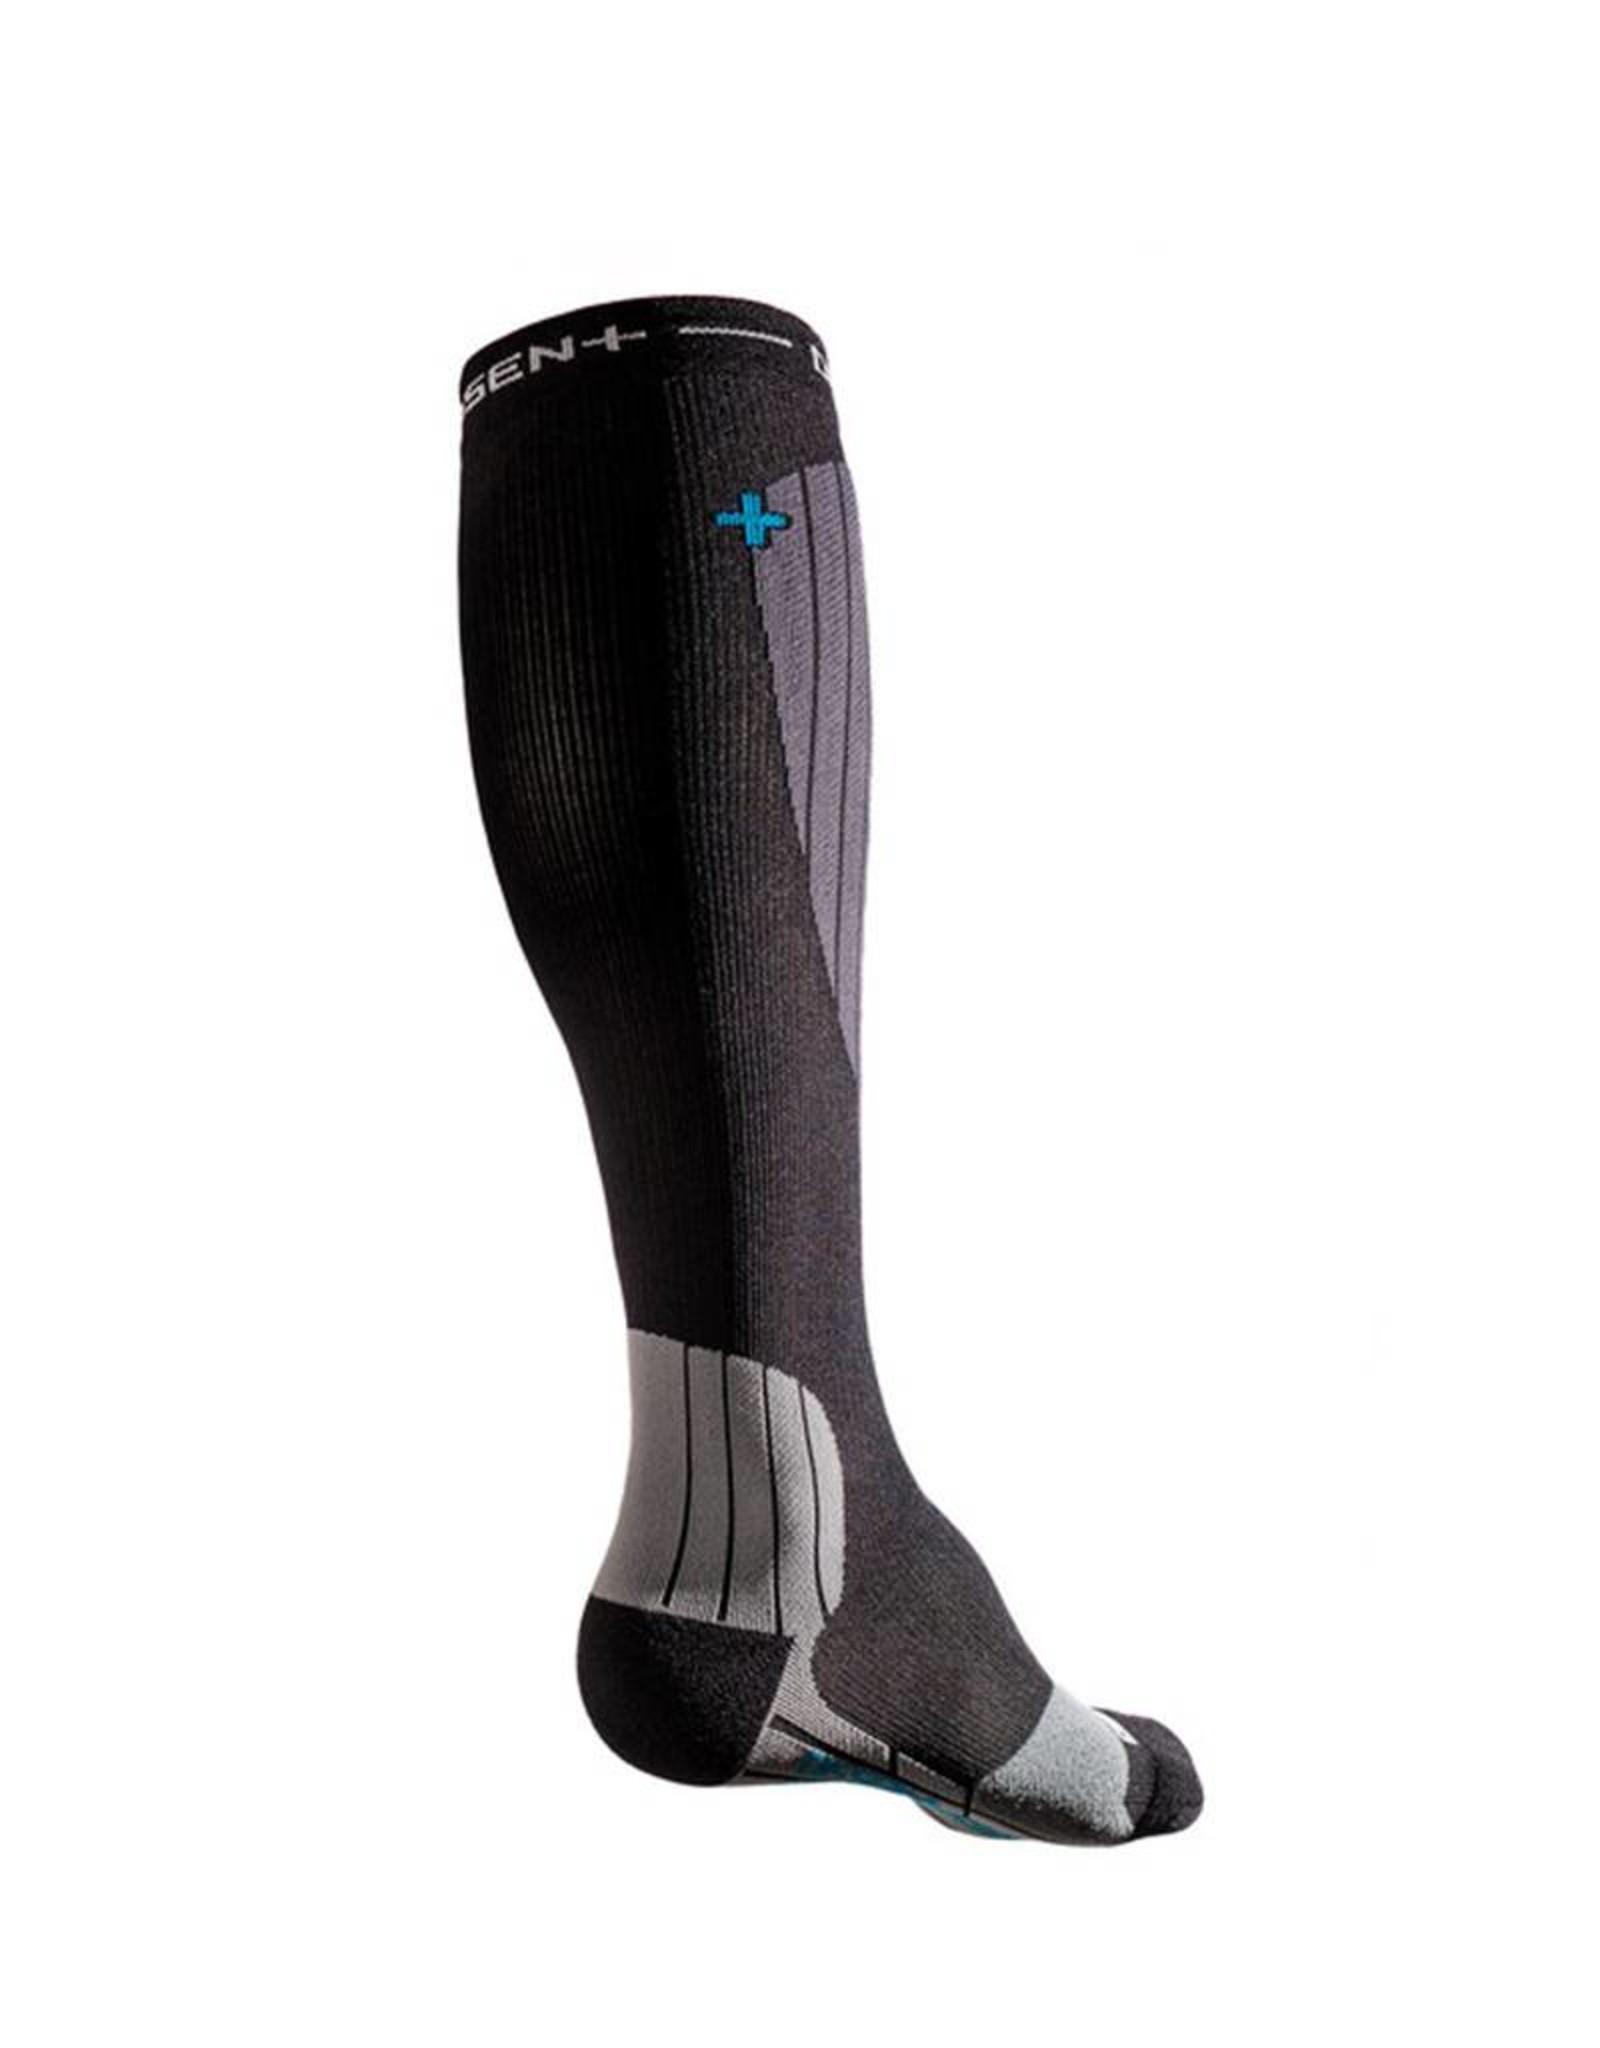 Bas Dissent Ski GFX Hybrid protect Compression Socks